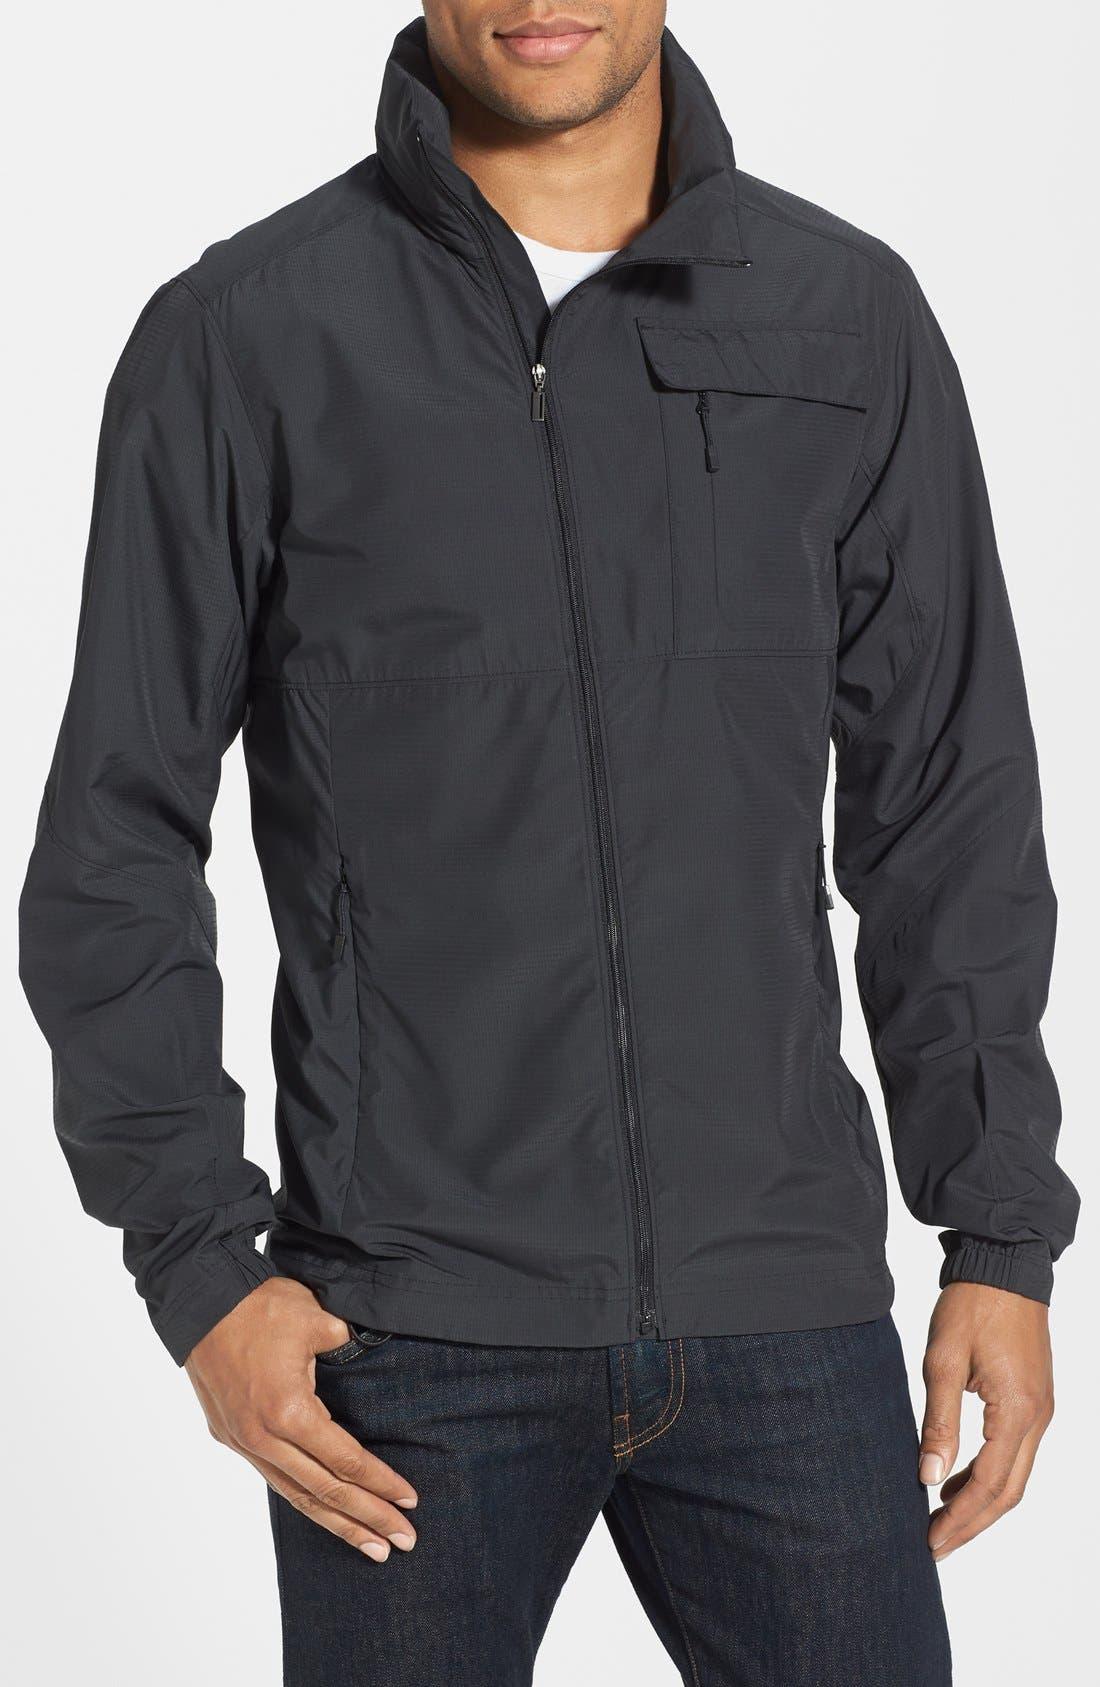 Main Image - Nau 'Lightbeam' Water Resistant Full Zip Jacket